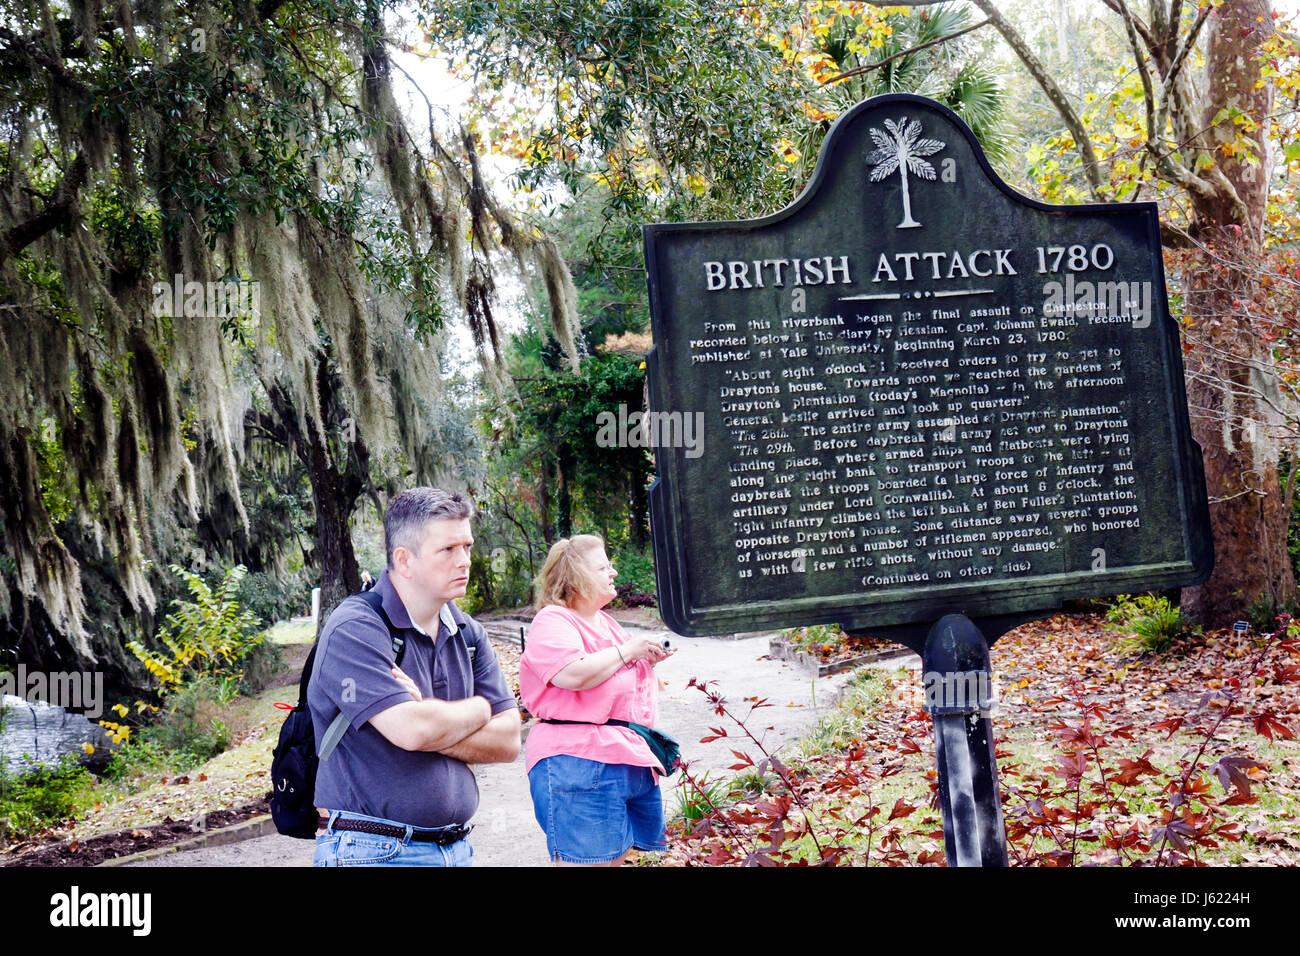 Charleston South Carolina Lowcountry Ashley River Road Magnolia Plantation and Gardens 1676 National Register of - Stock Image